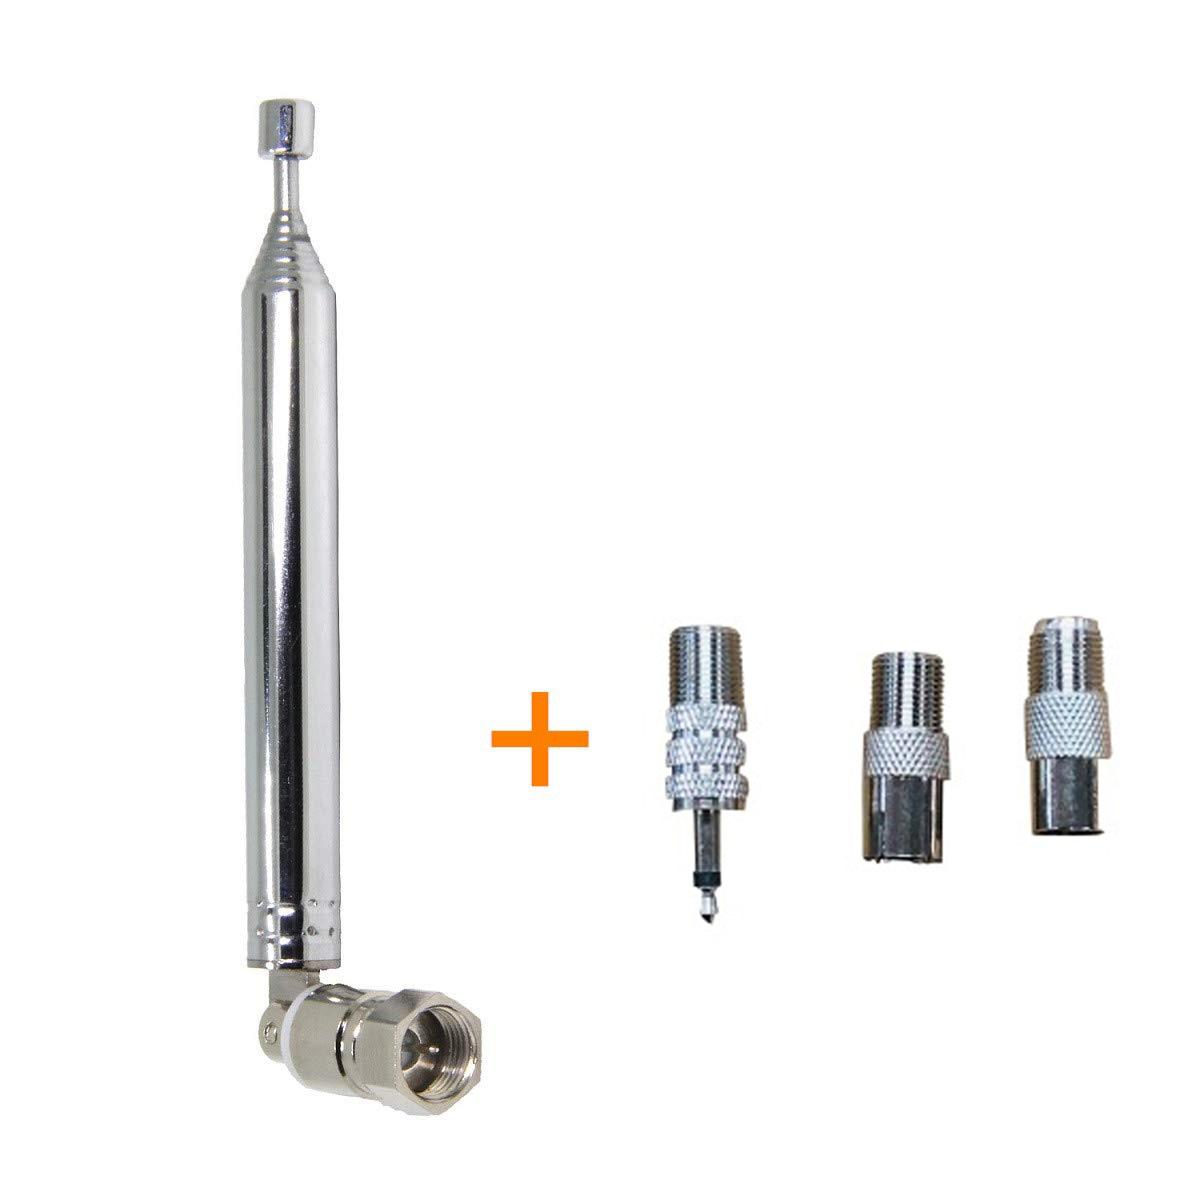 3.5dB Gain FM Radio Antenna Thread Design F Type Male Telescopic Antennas With 3 Adapters 3.5mm PAL Male/Female